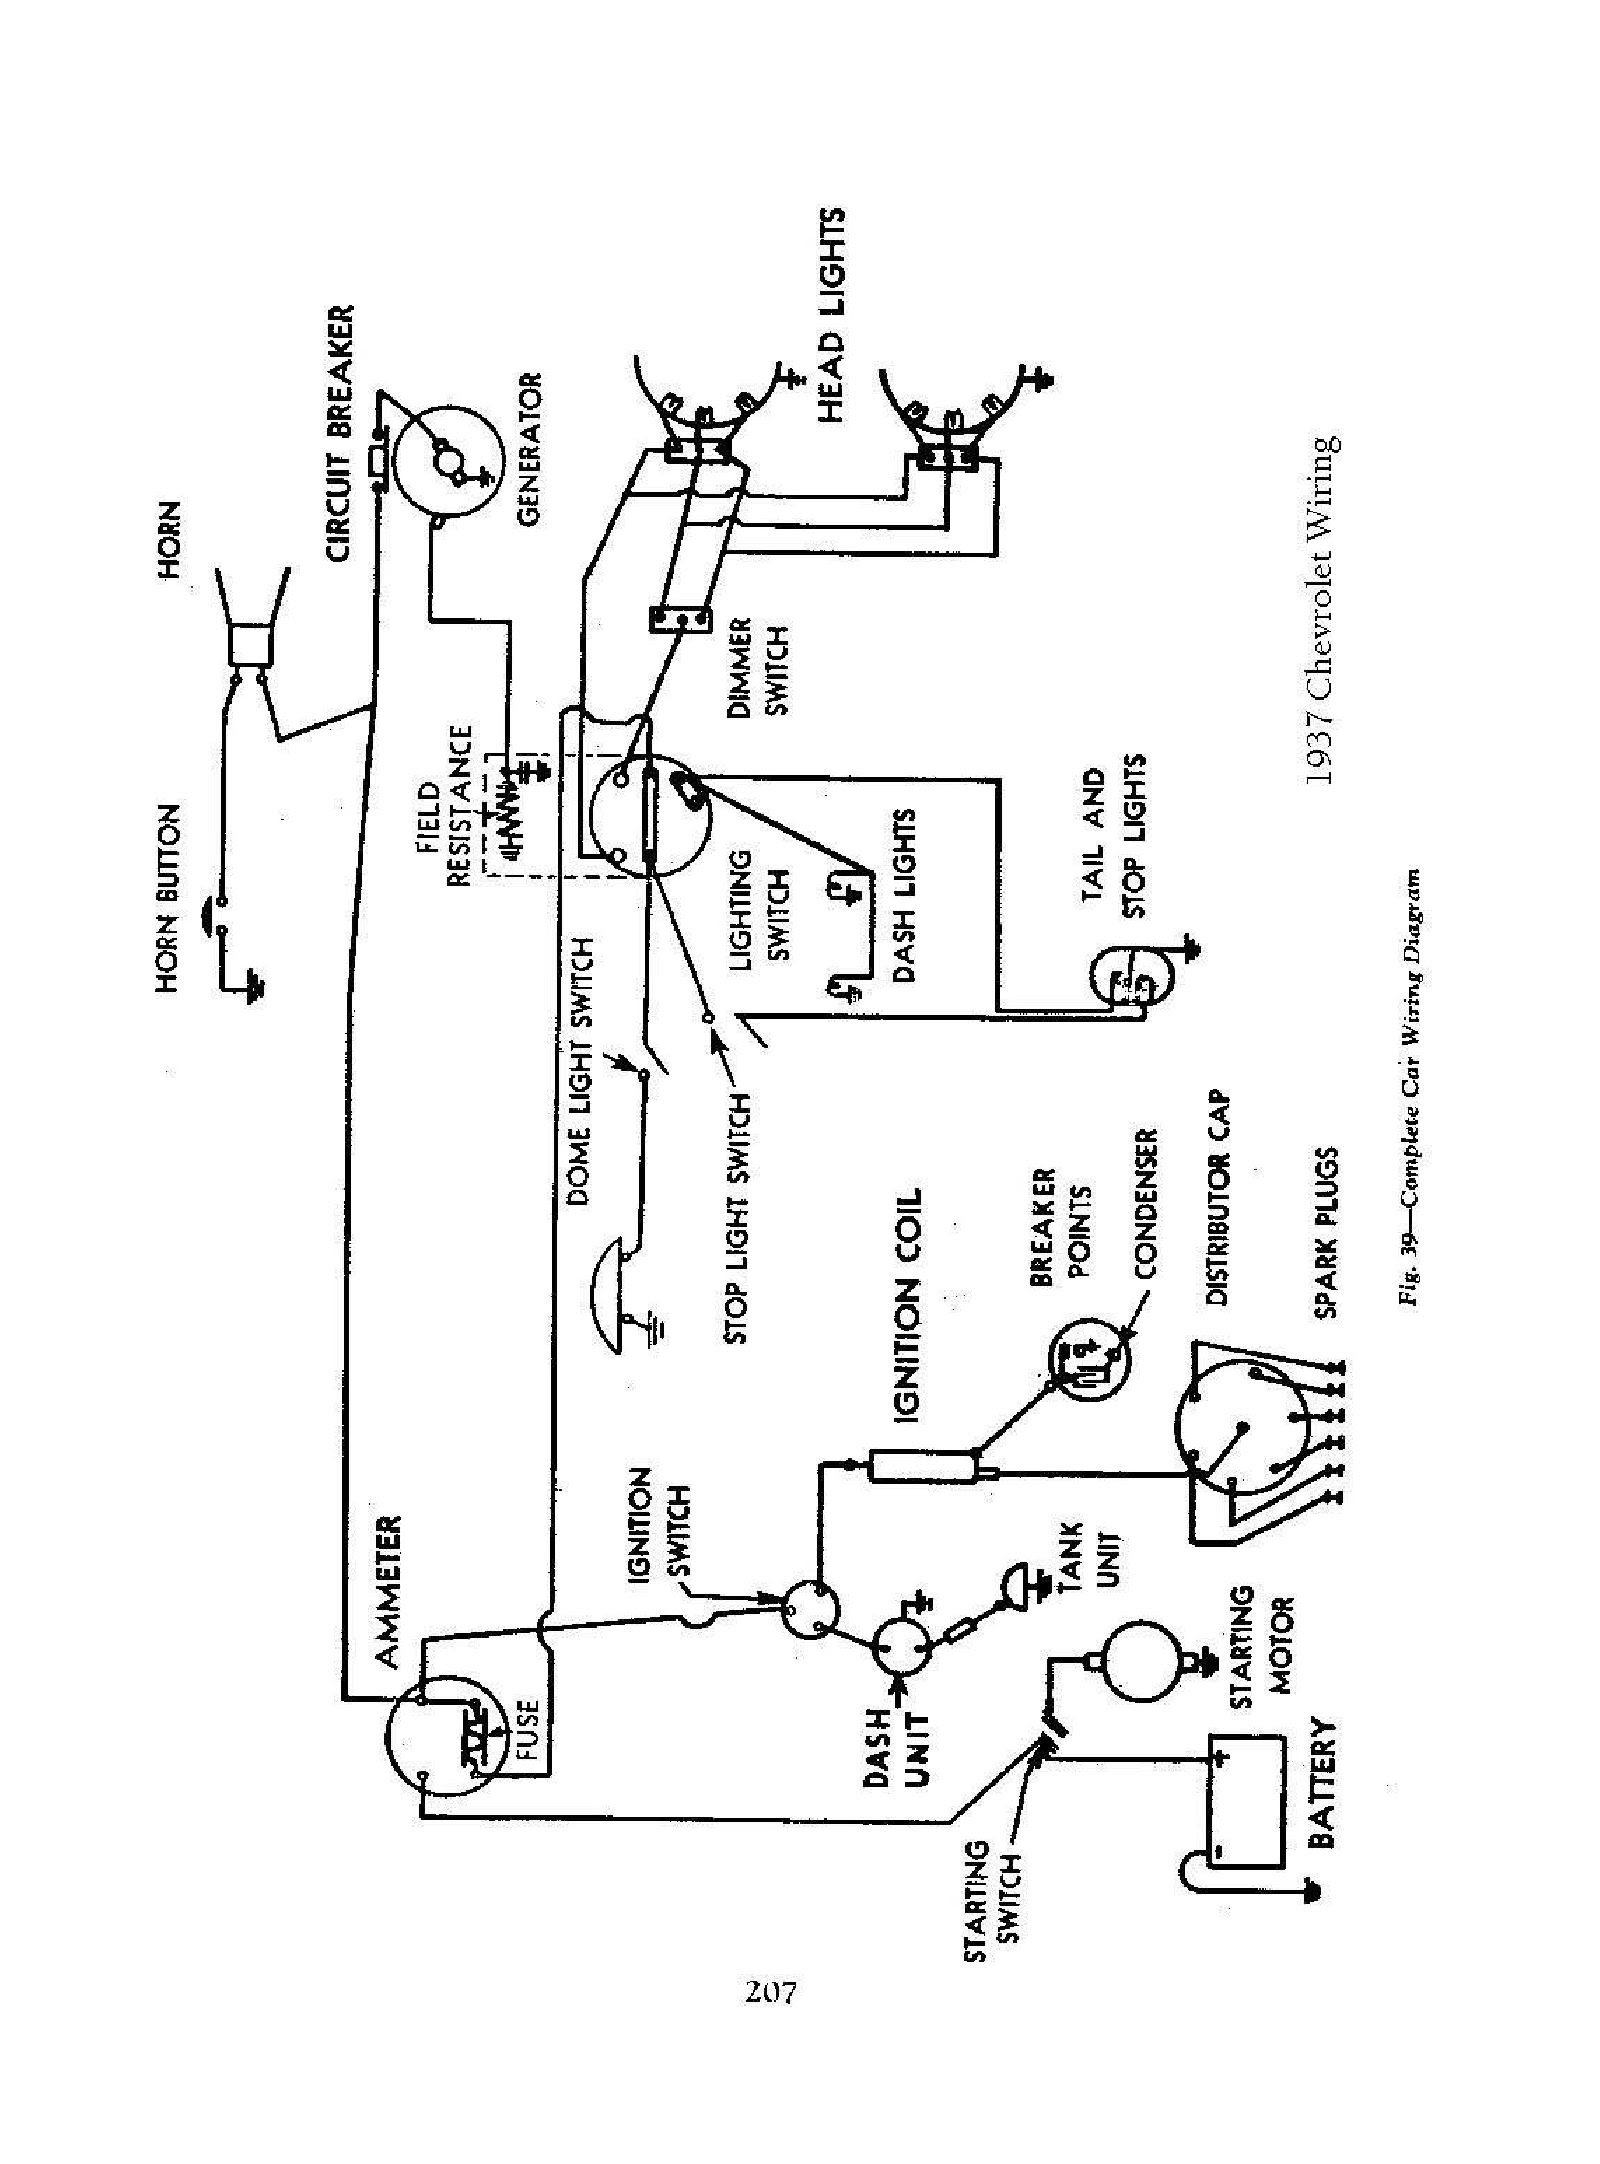 Diagram 55 Chevy Generator Wiring Diagram Full Version Hd Quality Wiring Diagram Foodwebdiagraml Ripettapalace It